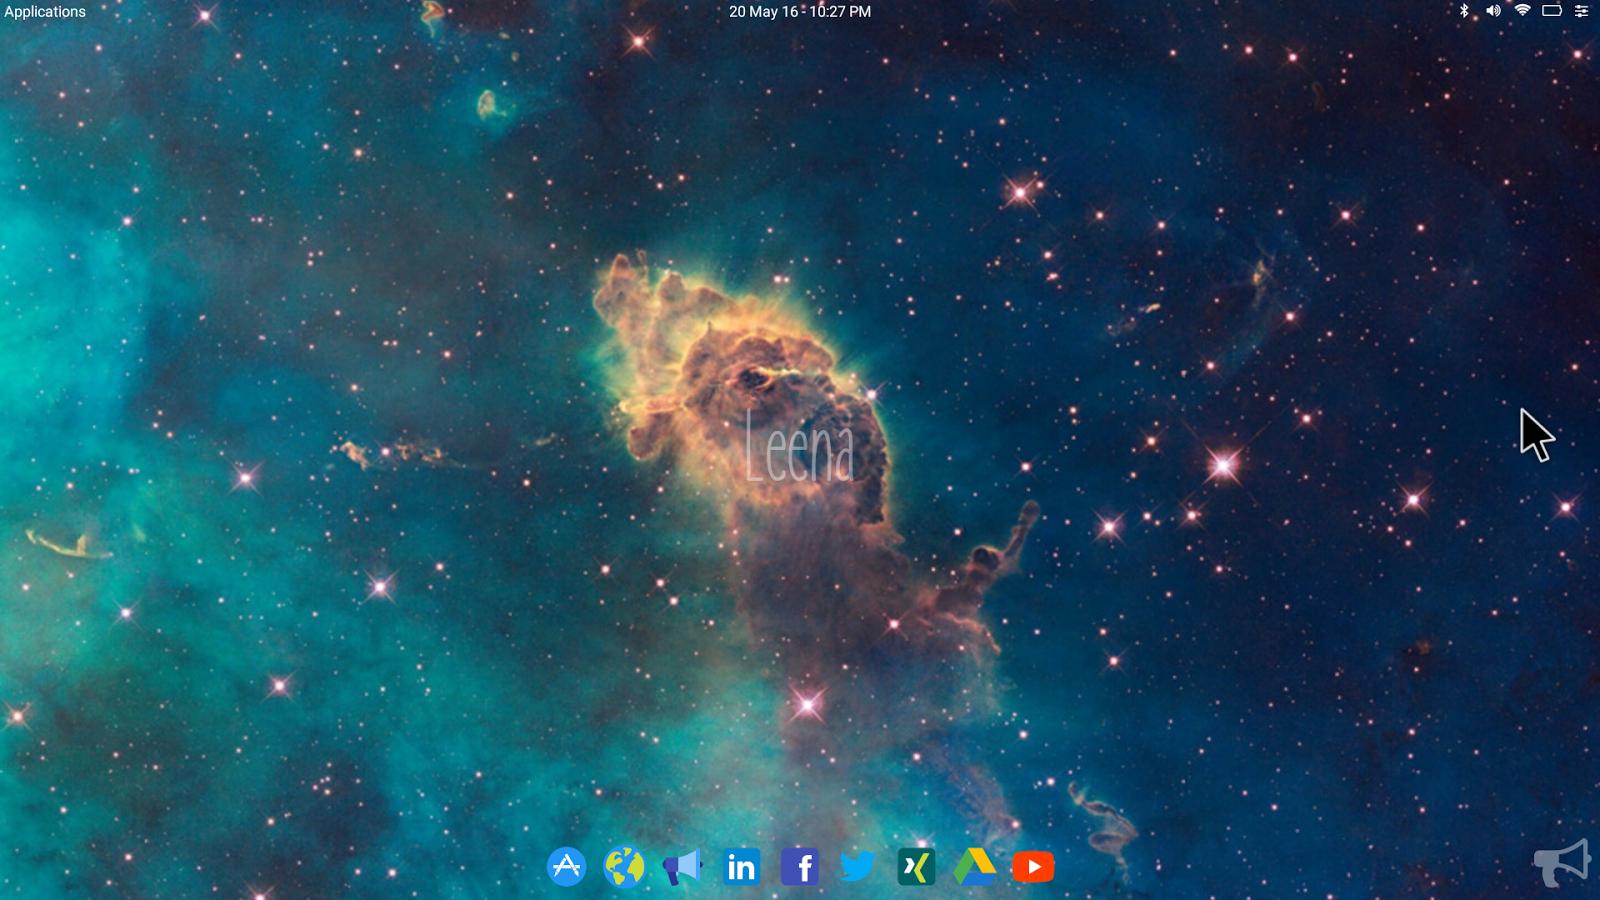 Download aplikasi graffiti creator java -  Leena Desktop Ui Multiwindow 0 4 2 Screenshot 8